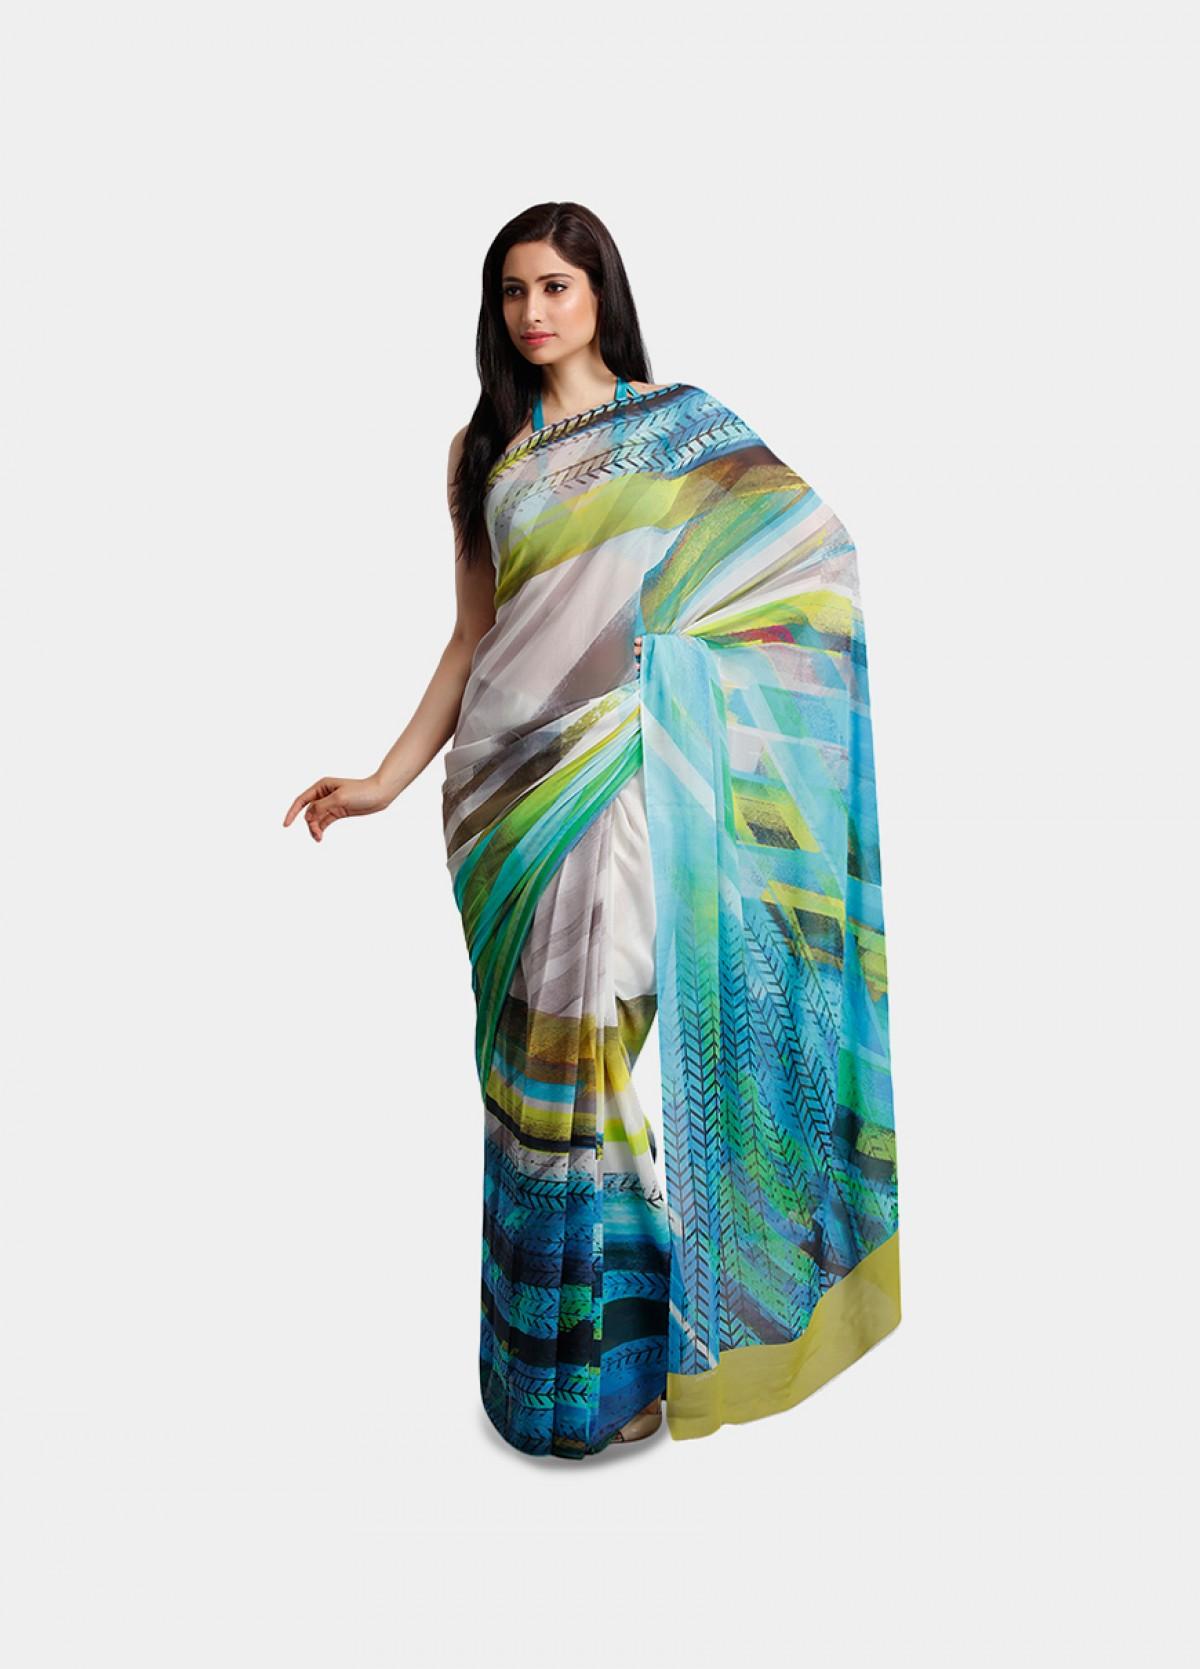 The Graphic Wall Art Sari